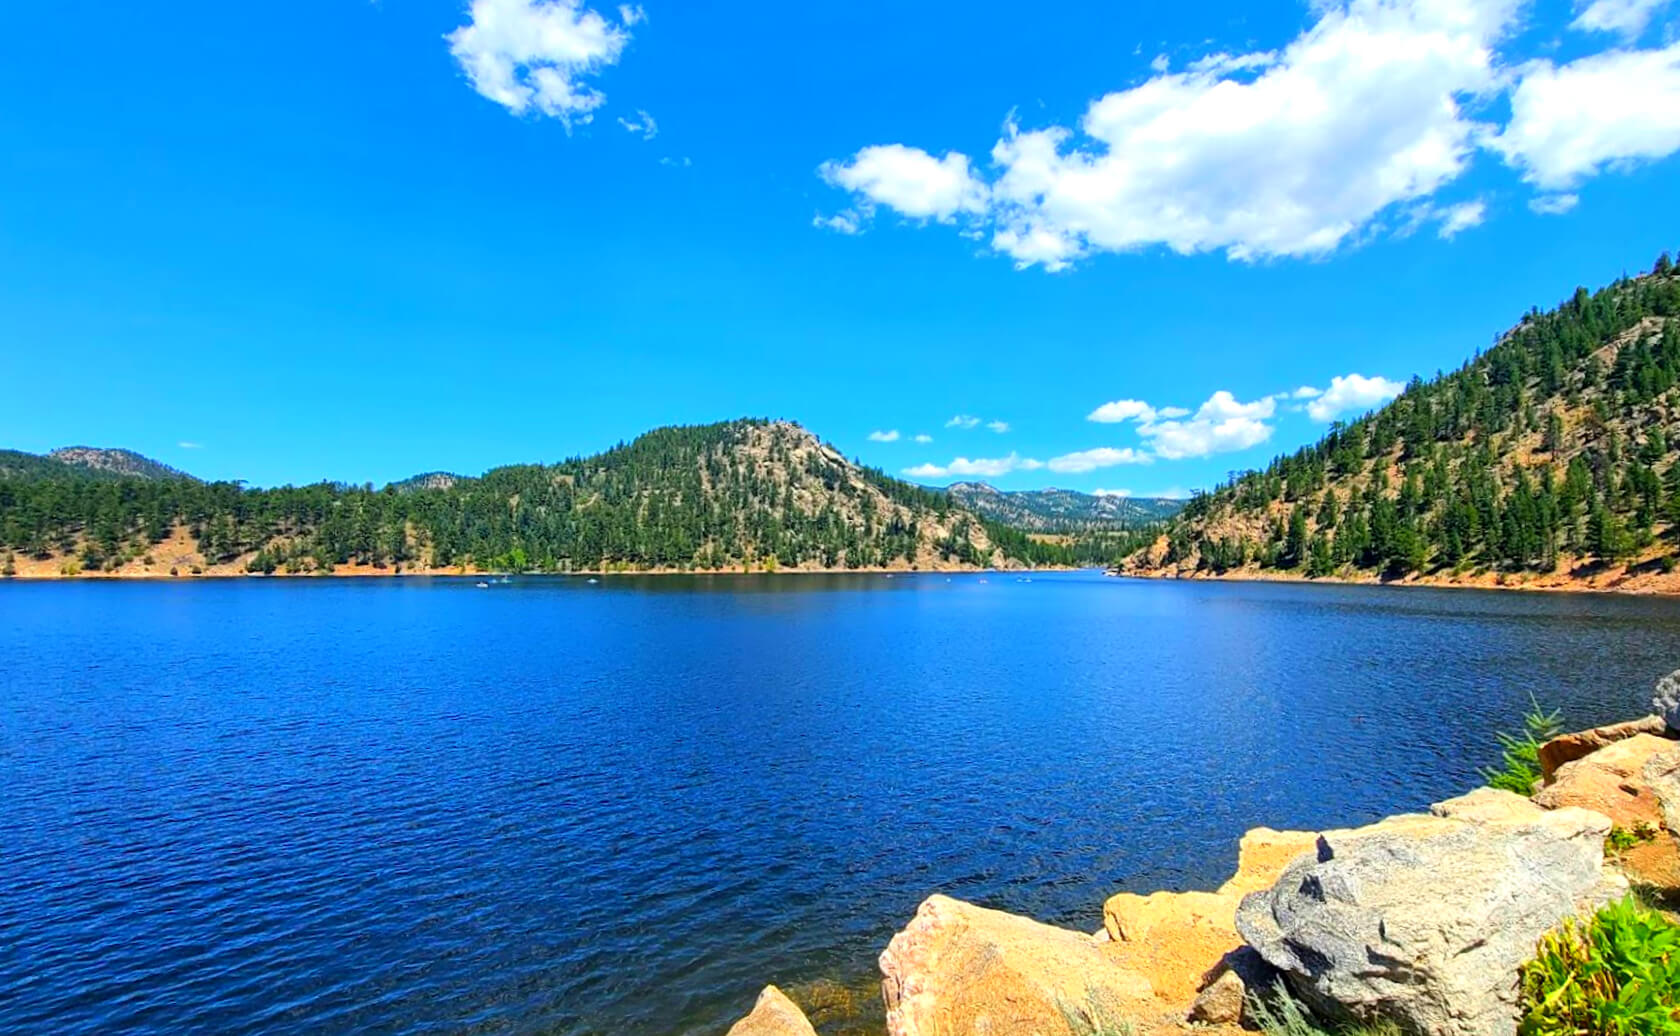 Gross-Lake-Fishing-Guide-Report-Colorado-02